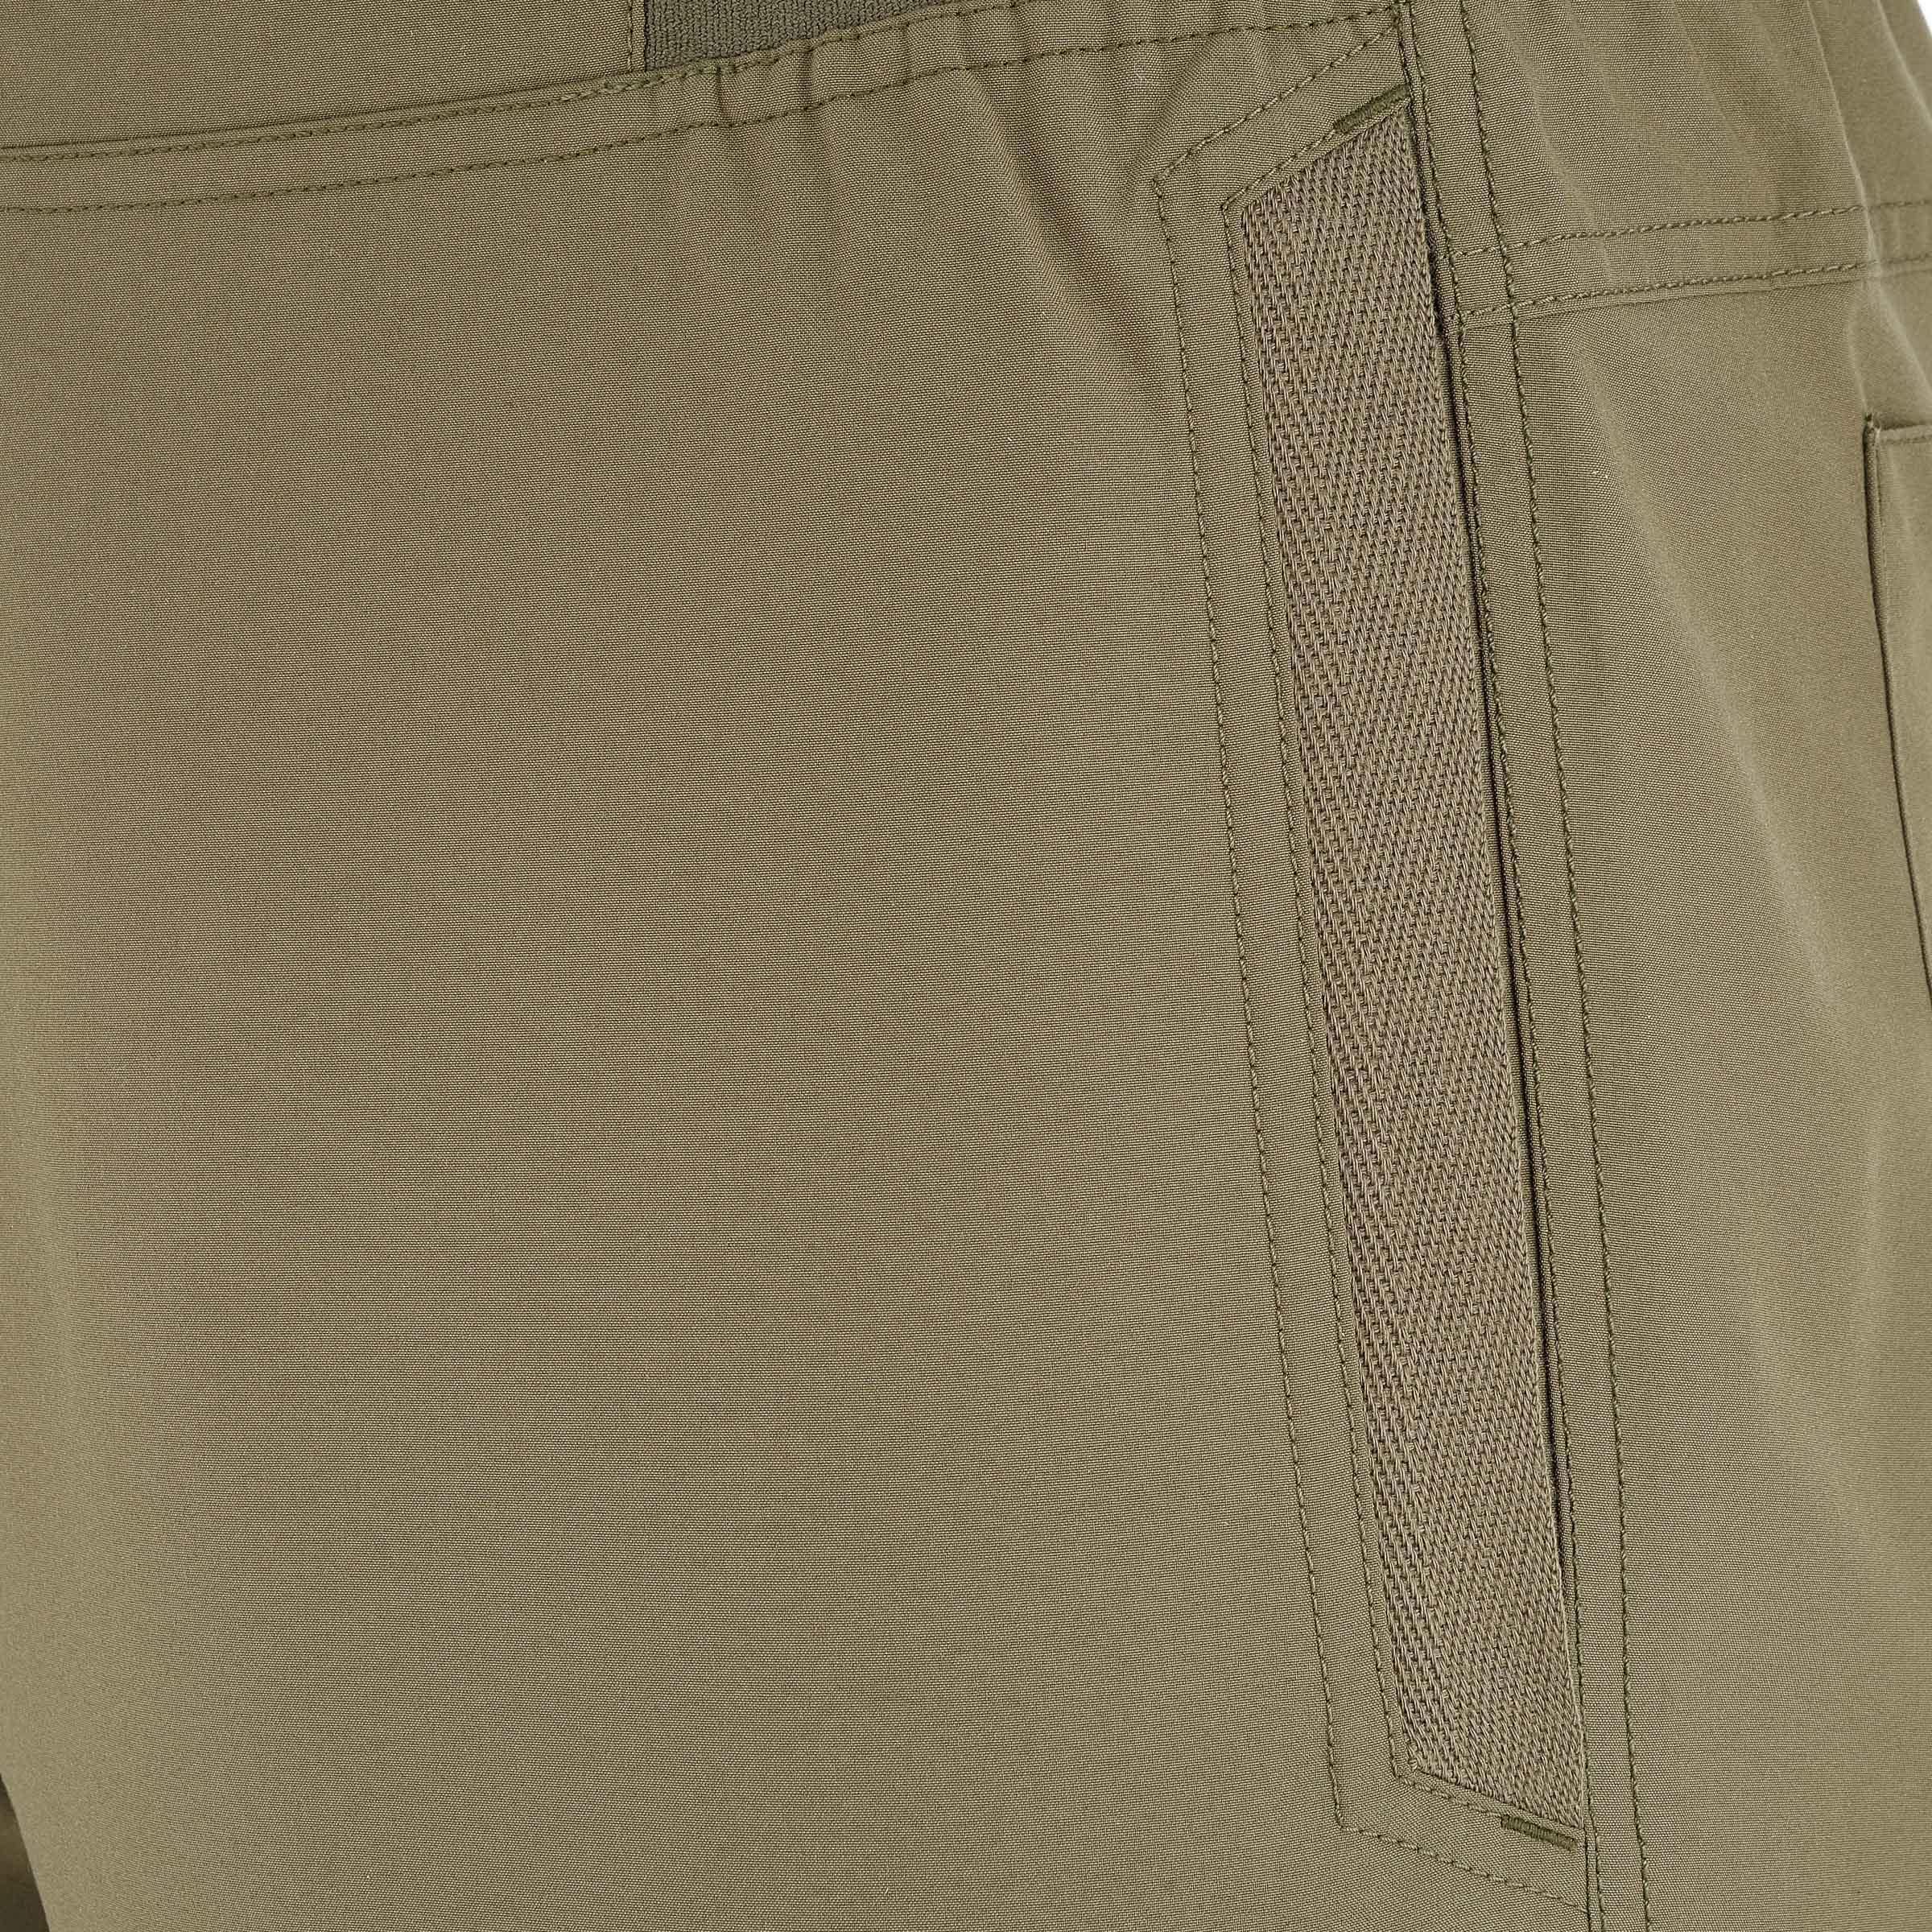 Arpenaz 50 Men's Hiking Trousers - Beige